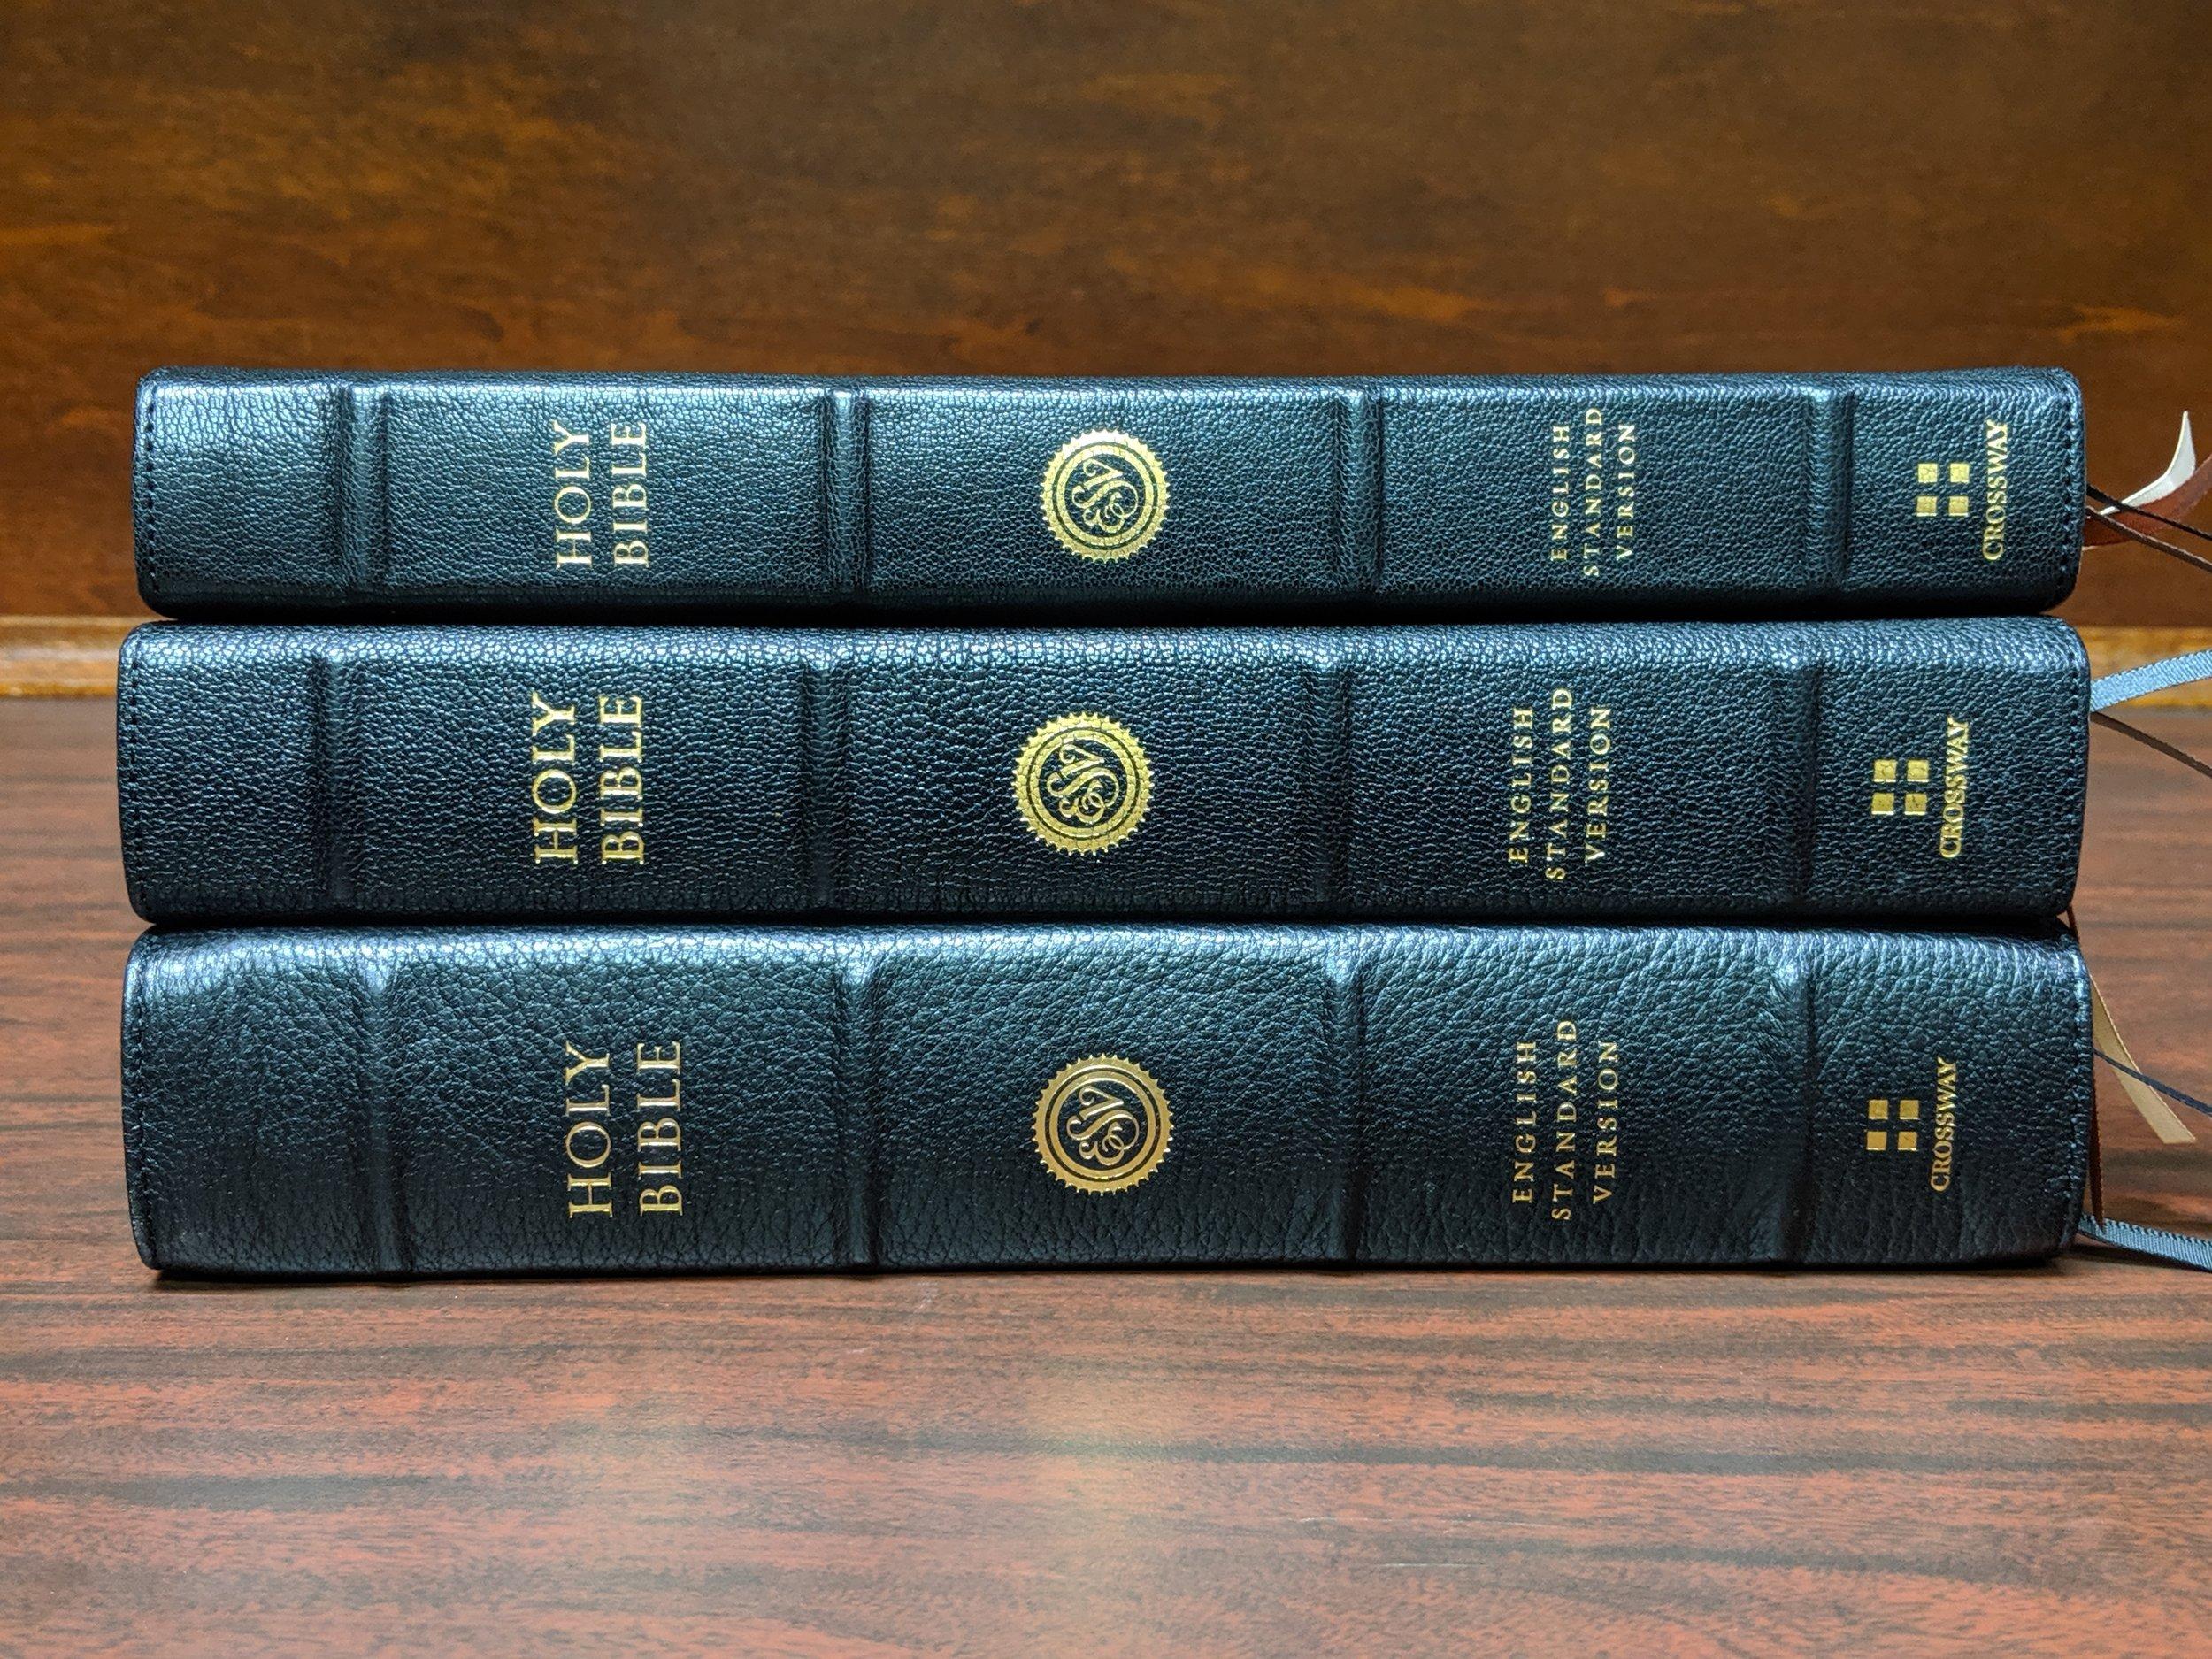 Bottom to top: ESV Preaching Bible, Heirloom Legacy, ESV Omega